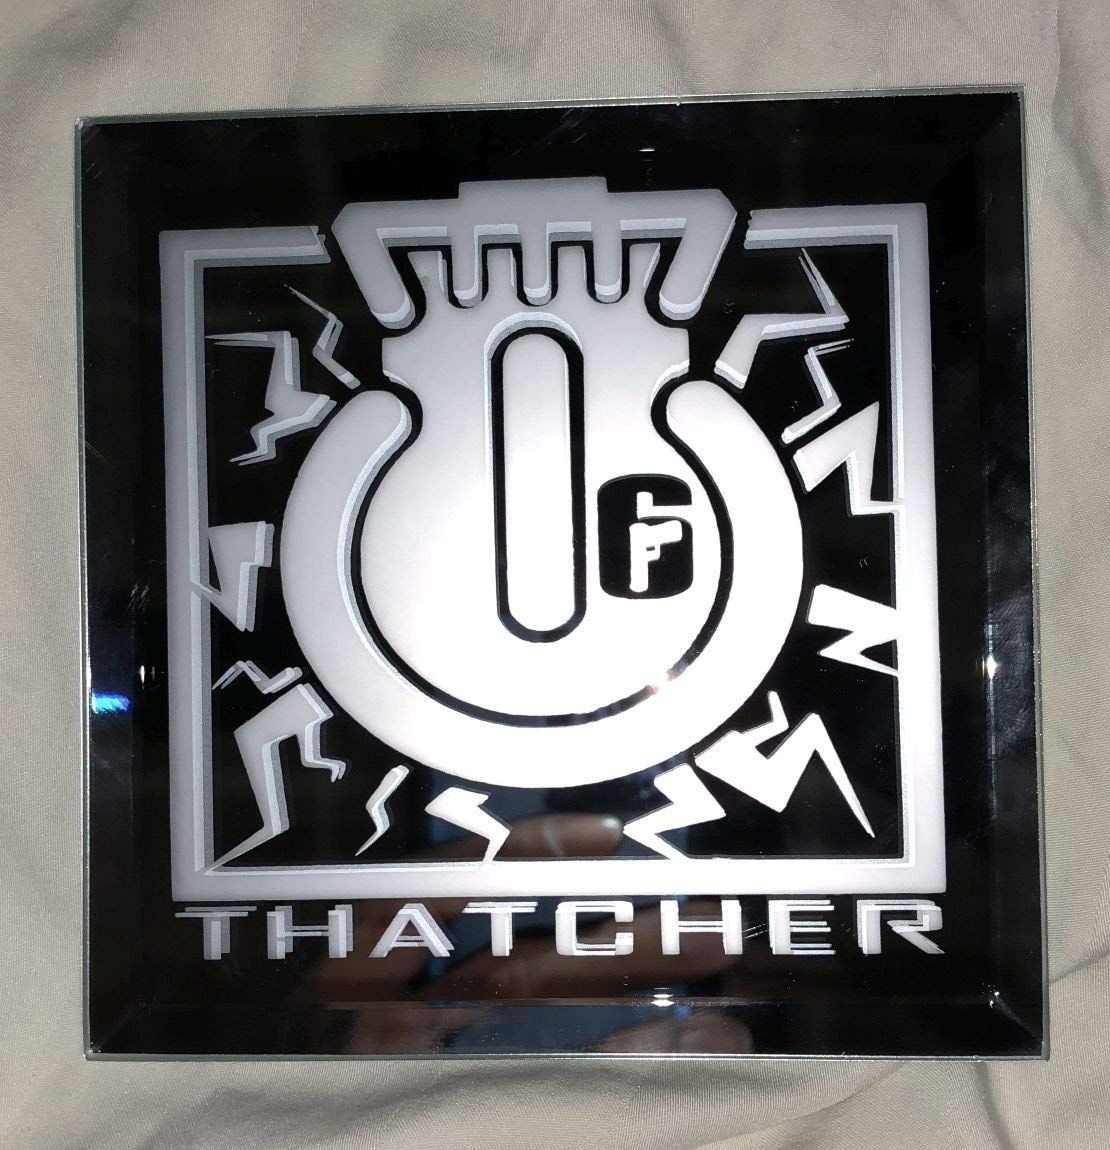 Rainbow Six Siege Thatcher Limited Edition Logo Mirror